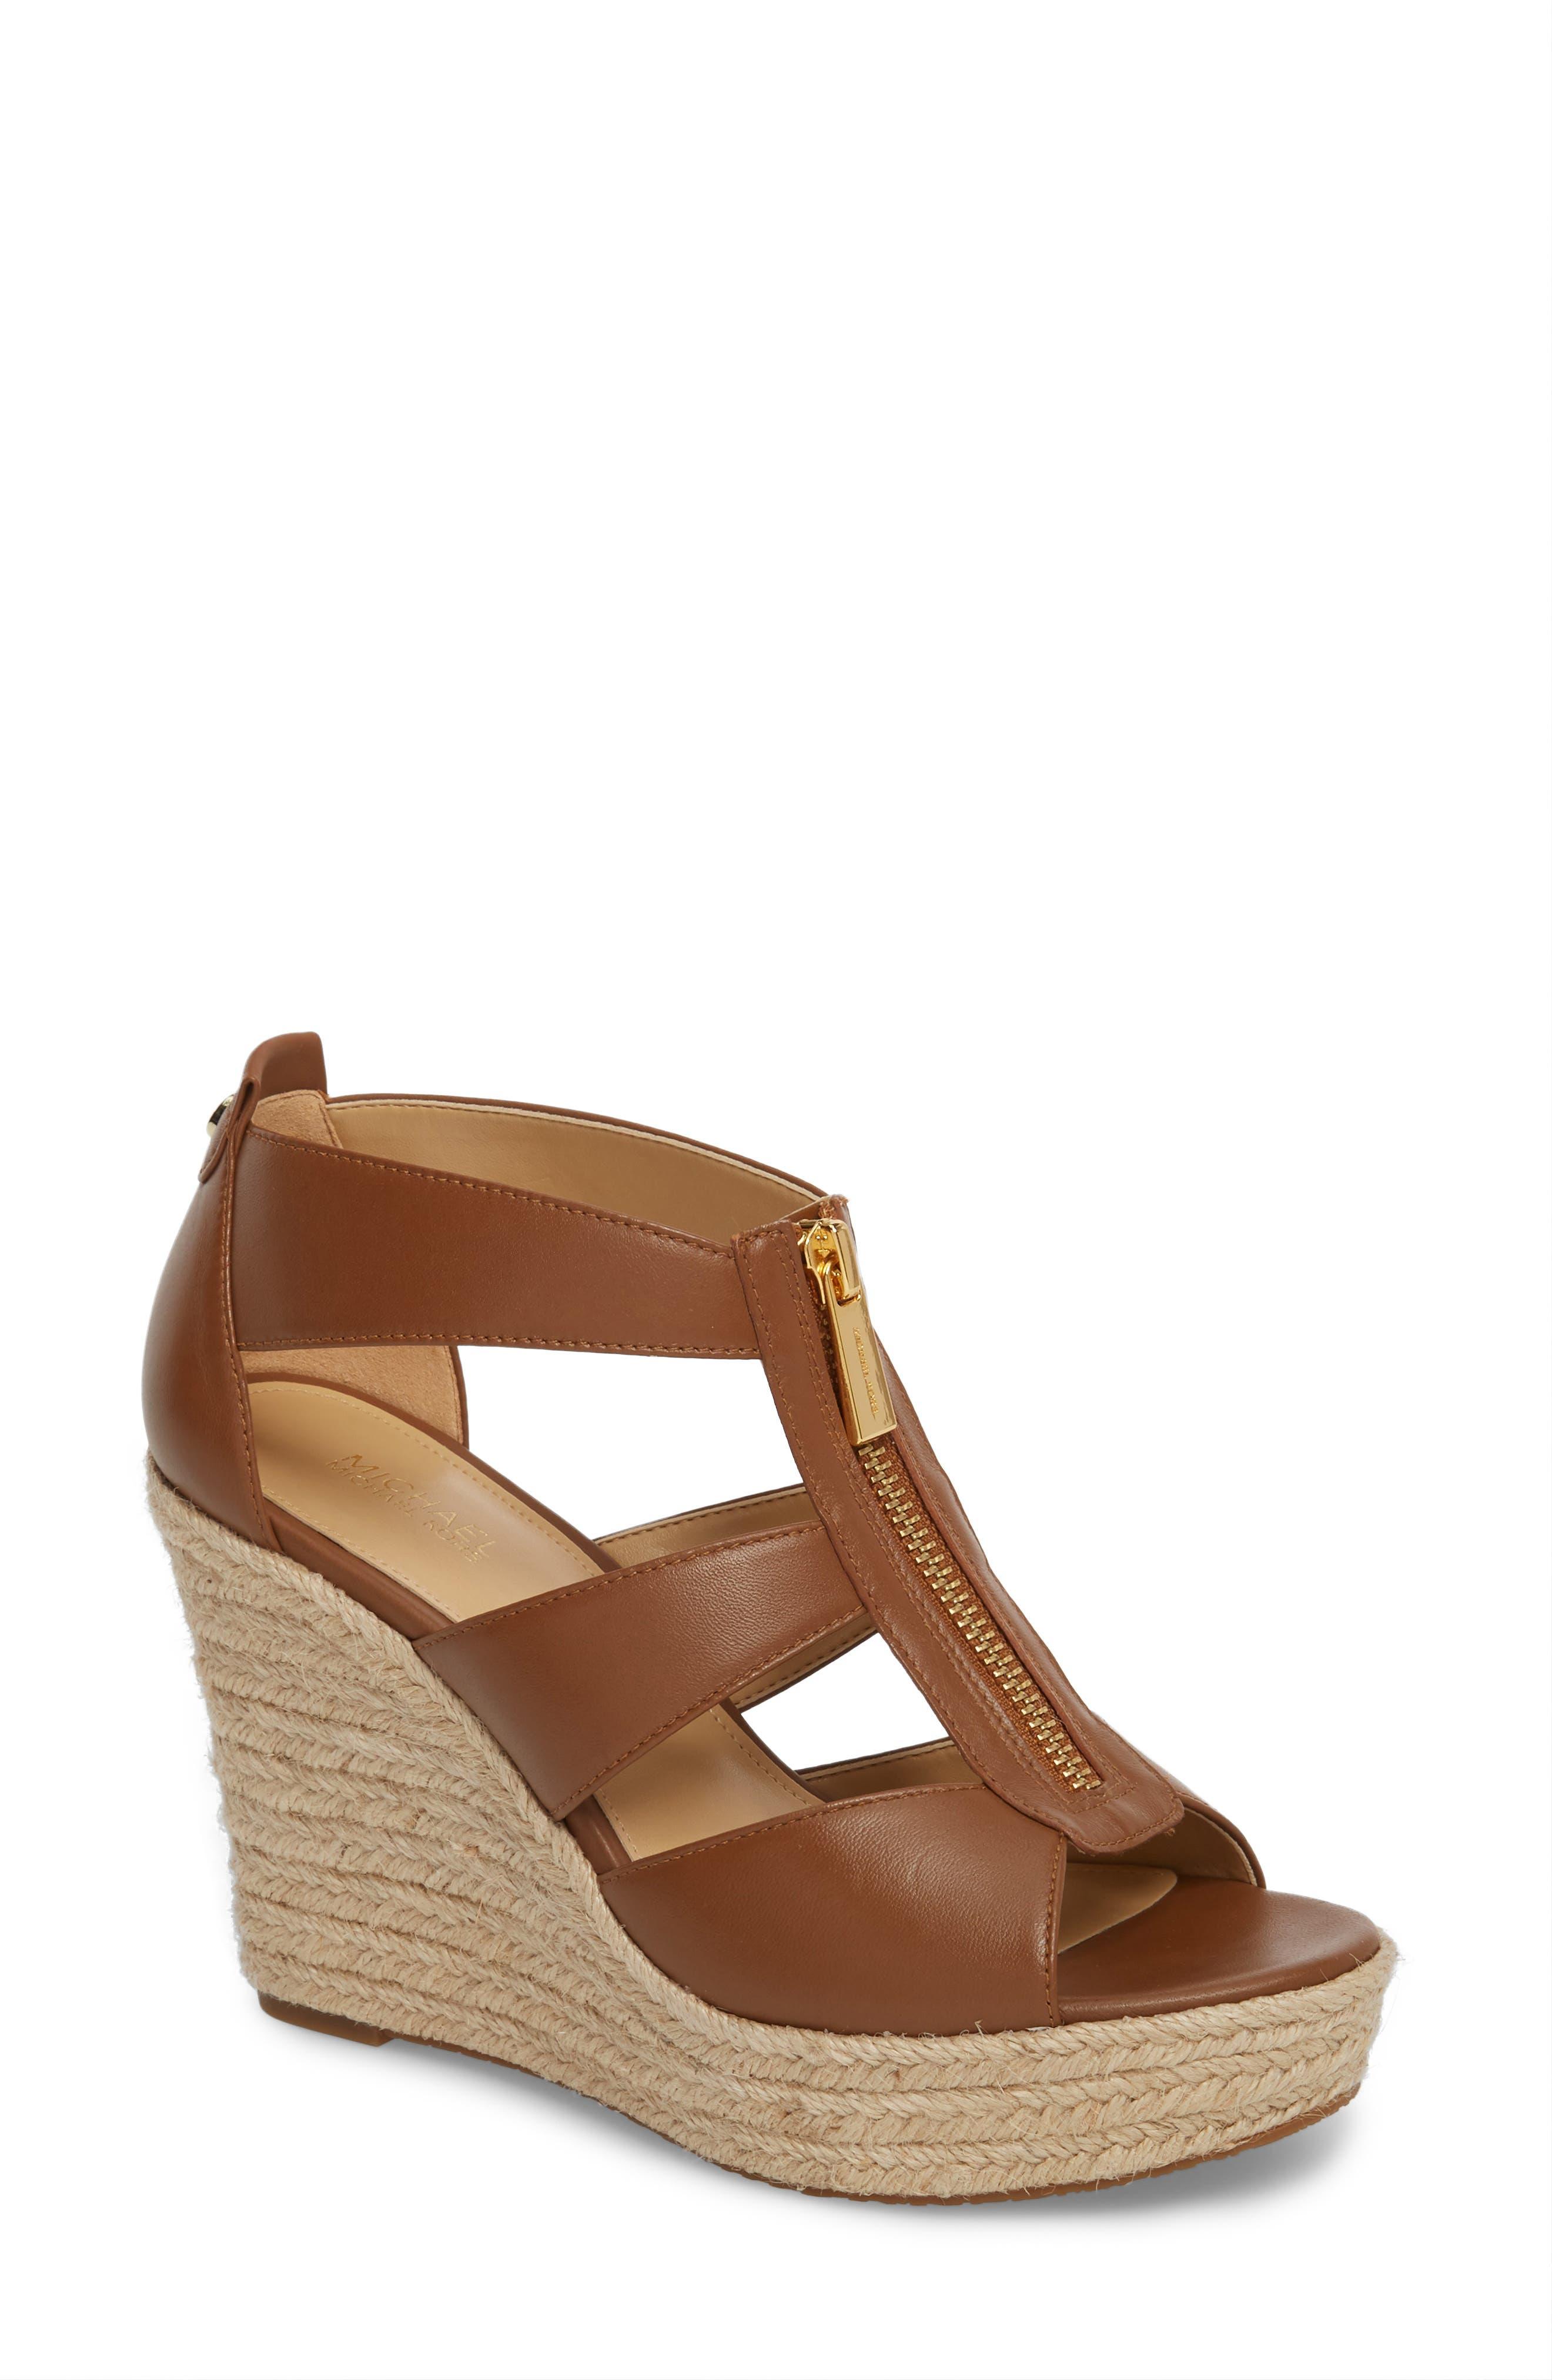 MICHAEL Michael Kors Damita Wedge Sandal Women